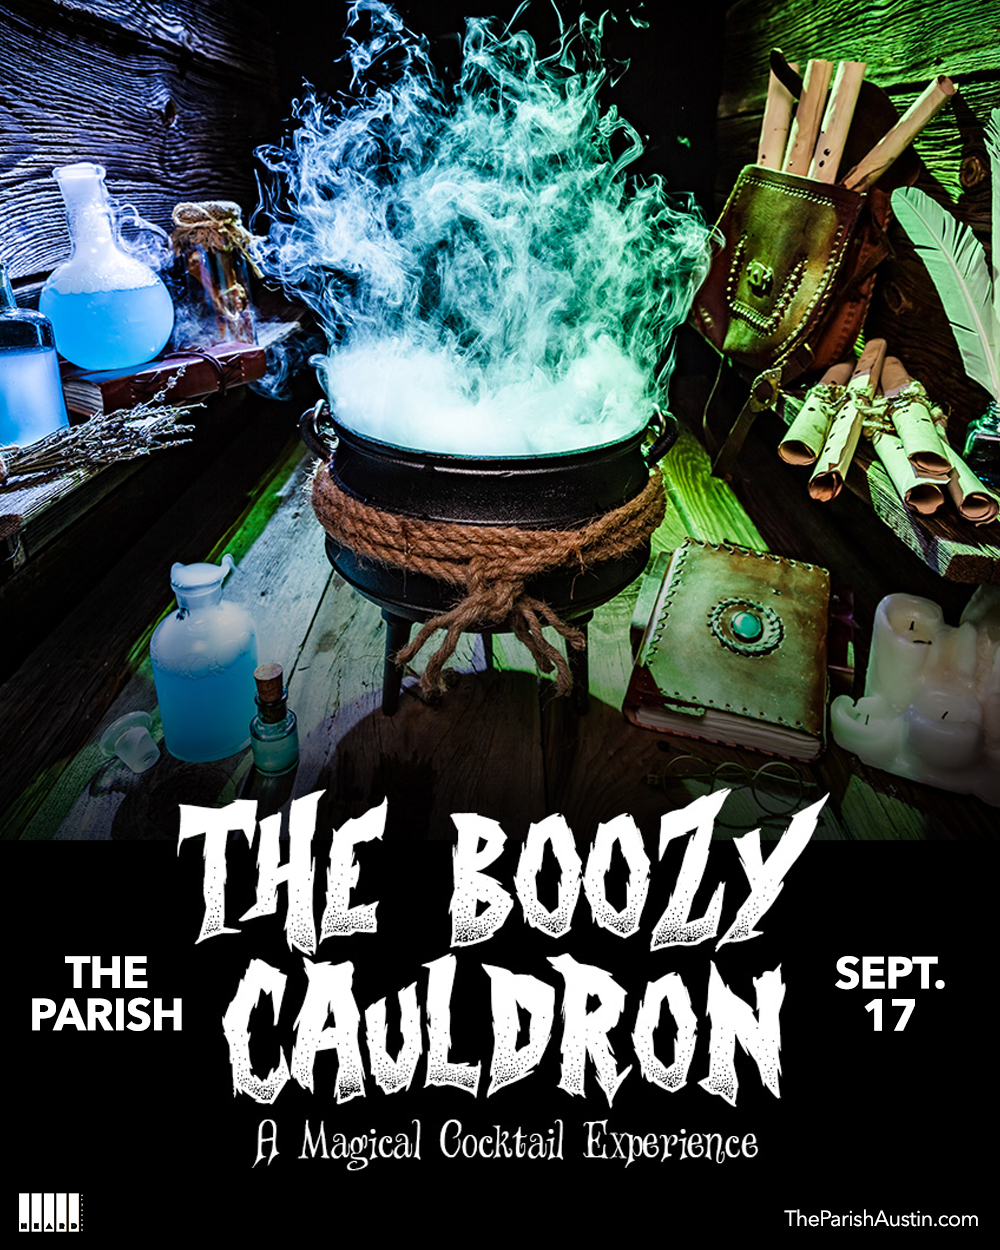 The Boozy Cauldron: